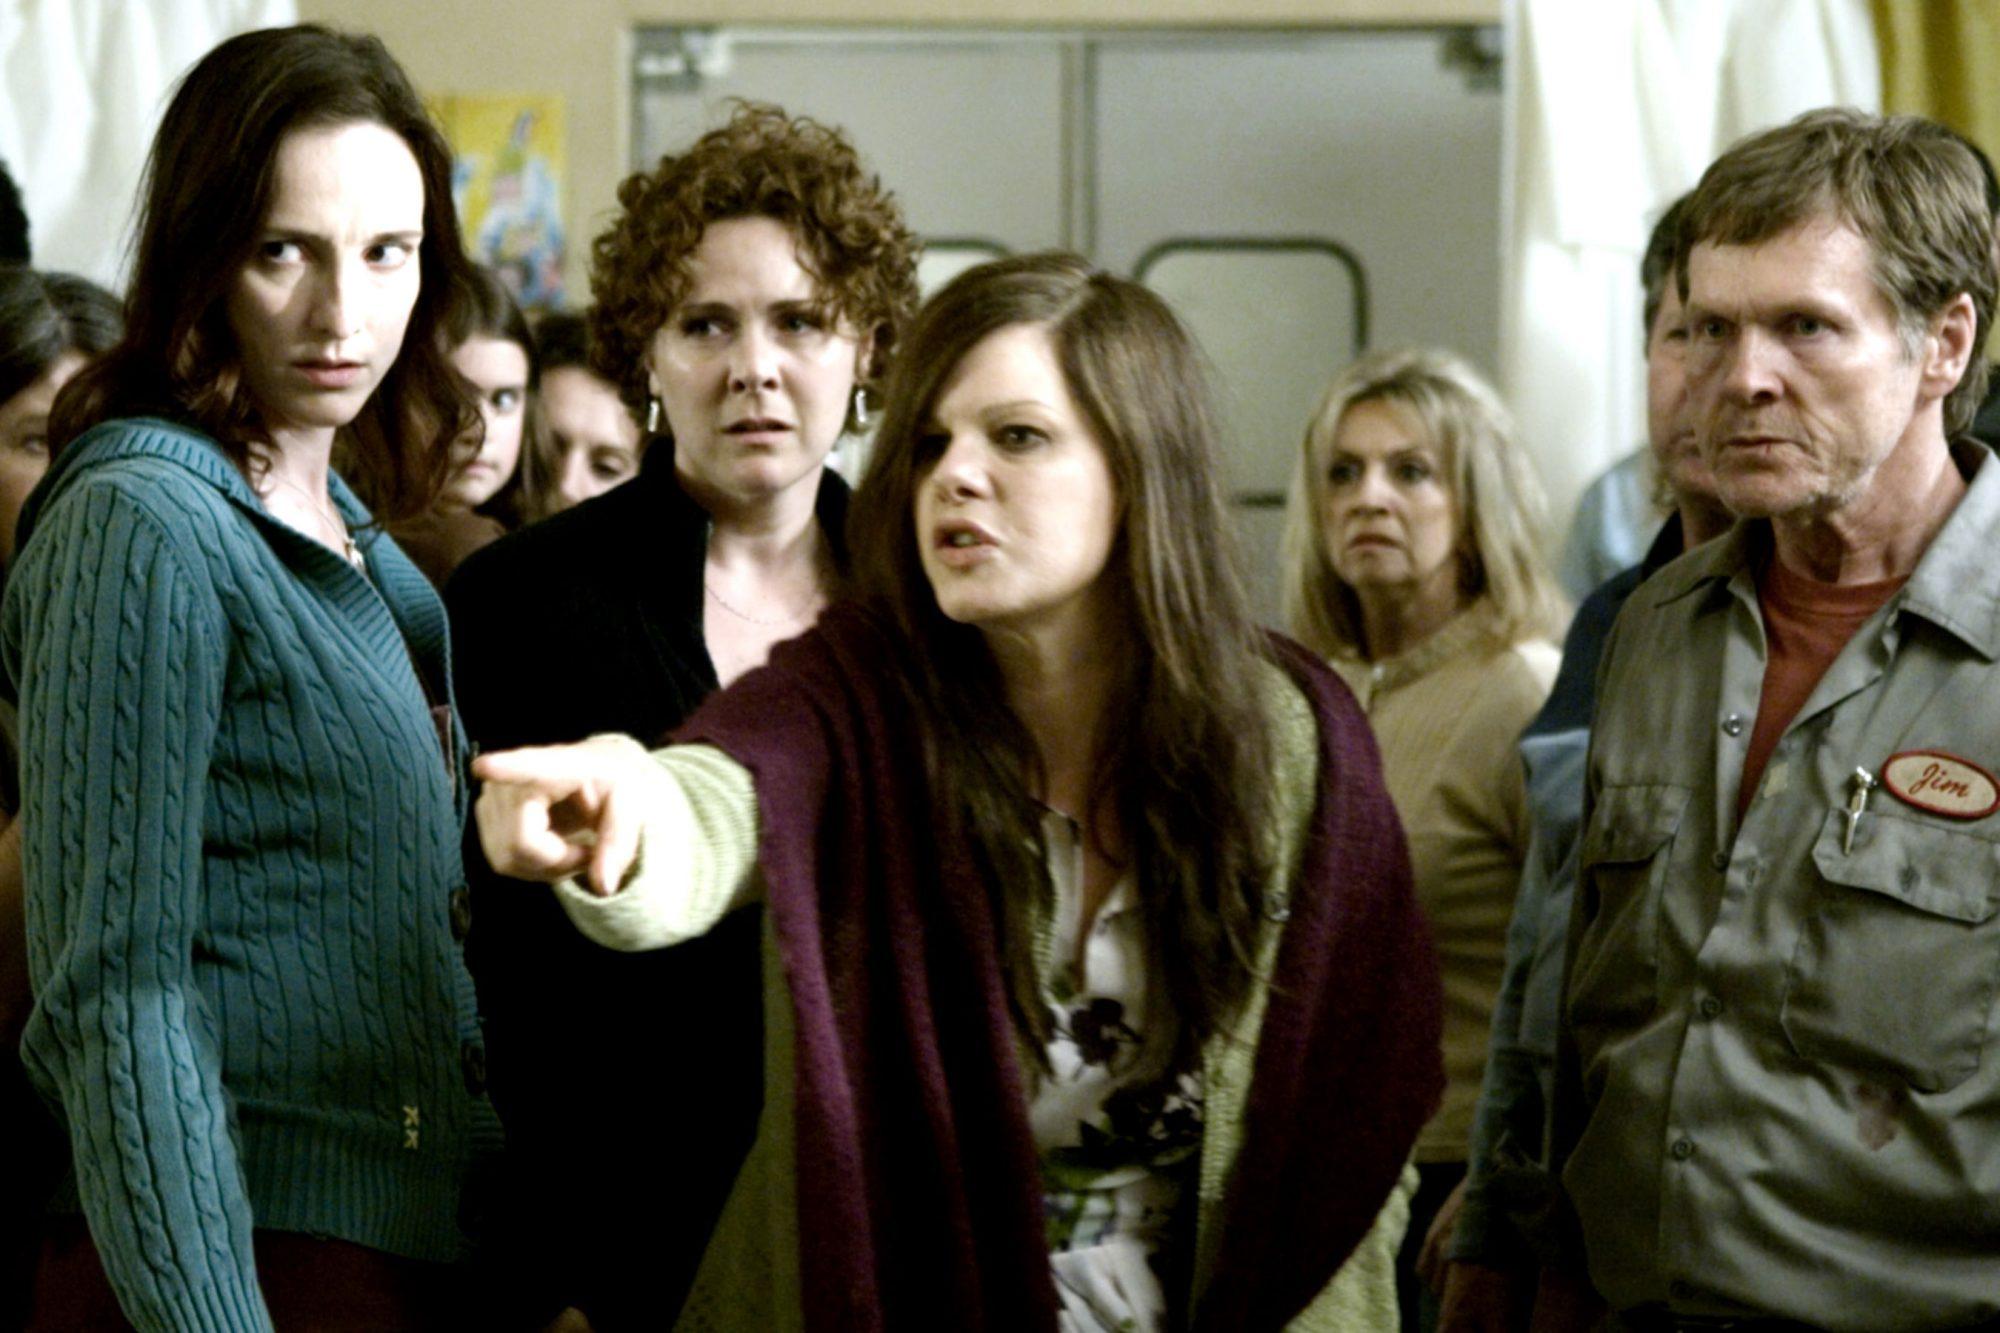 THE MIST, Marcia Gay Harden (center), William Sadler (front right), 2007. ©Weinstein Company/courtes